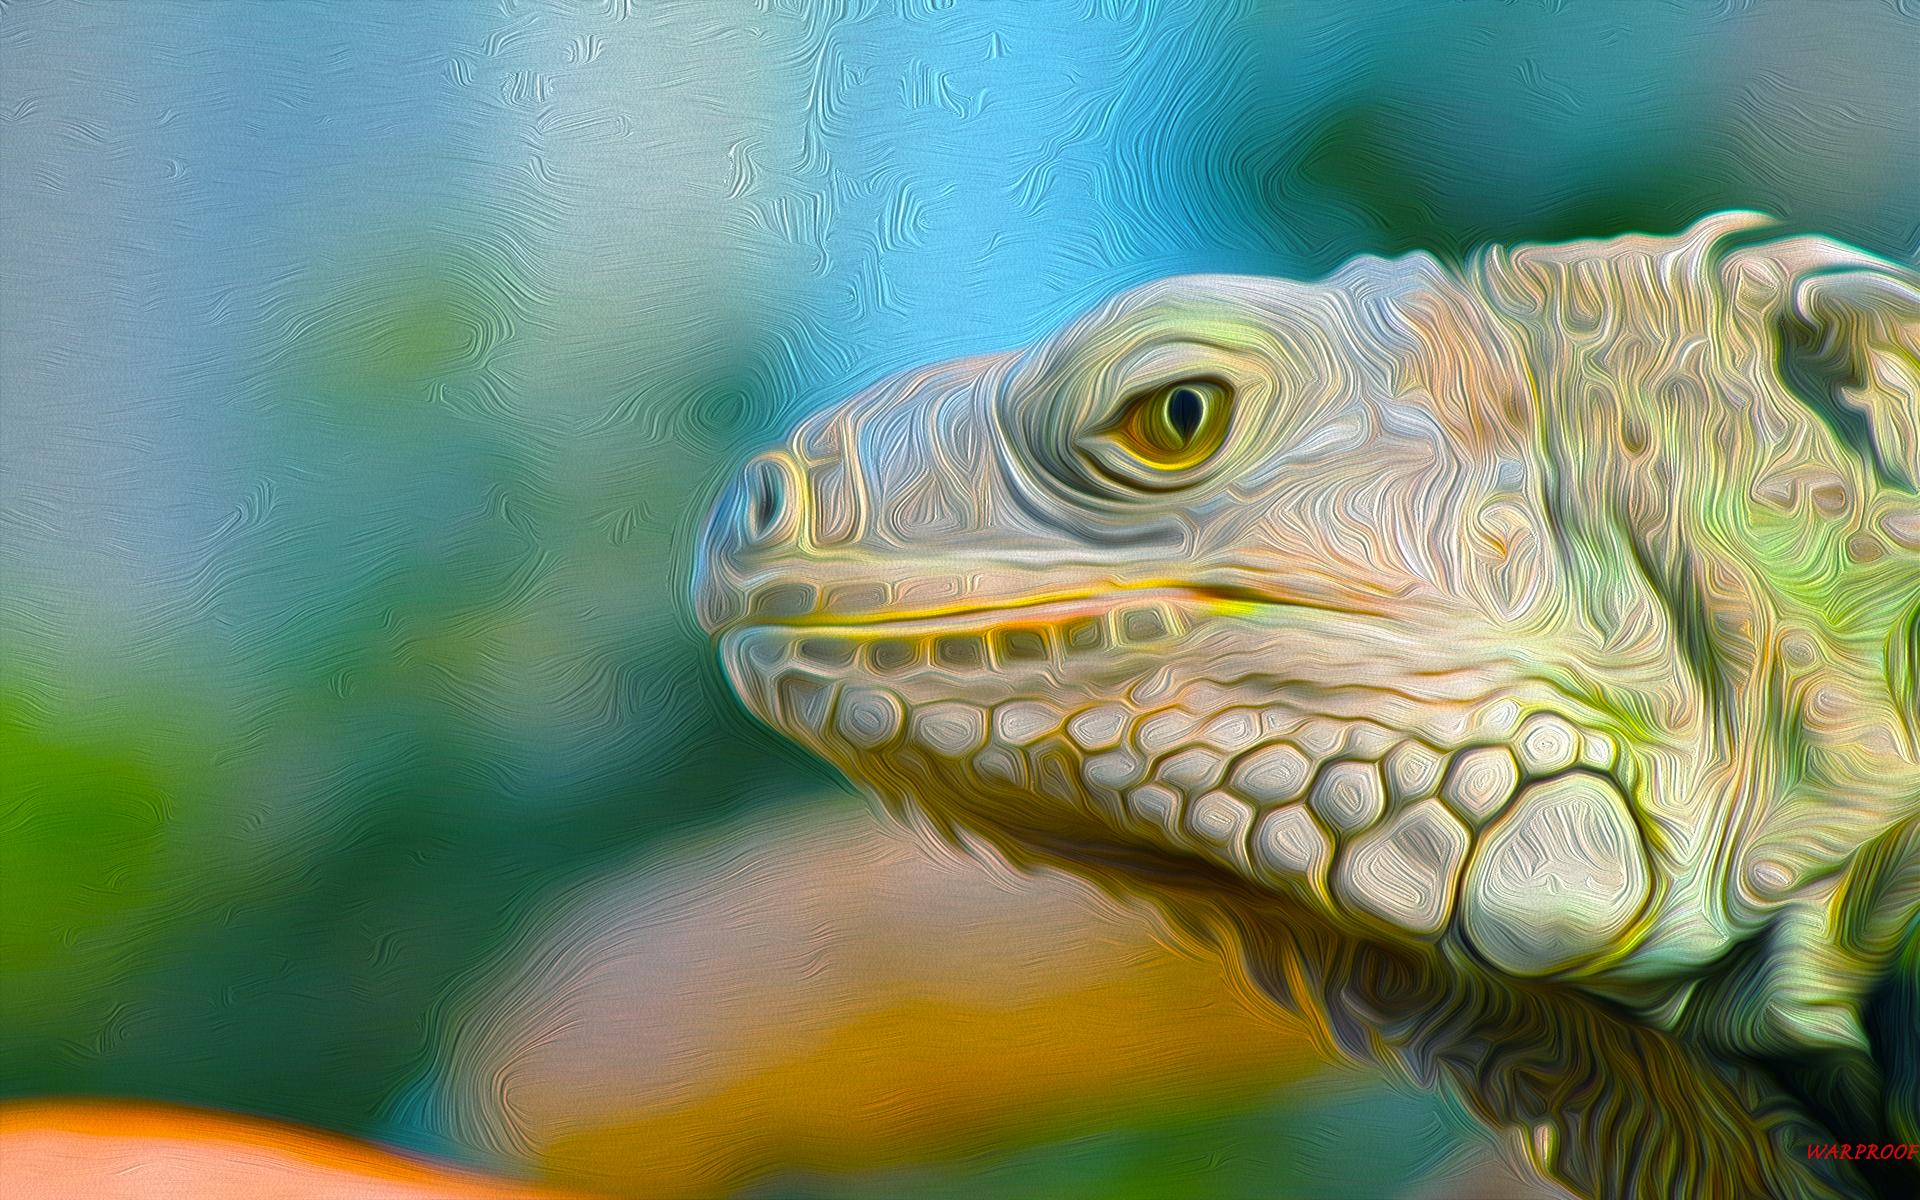 IGUANA HD Wallpaper Background Image 1920x1200 ID441833 1920x1200